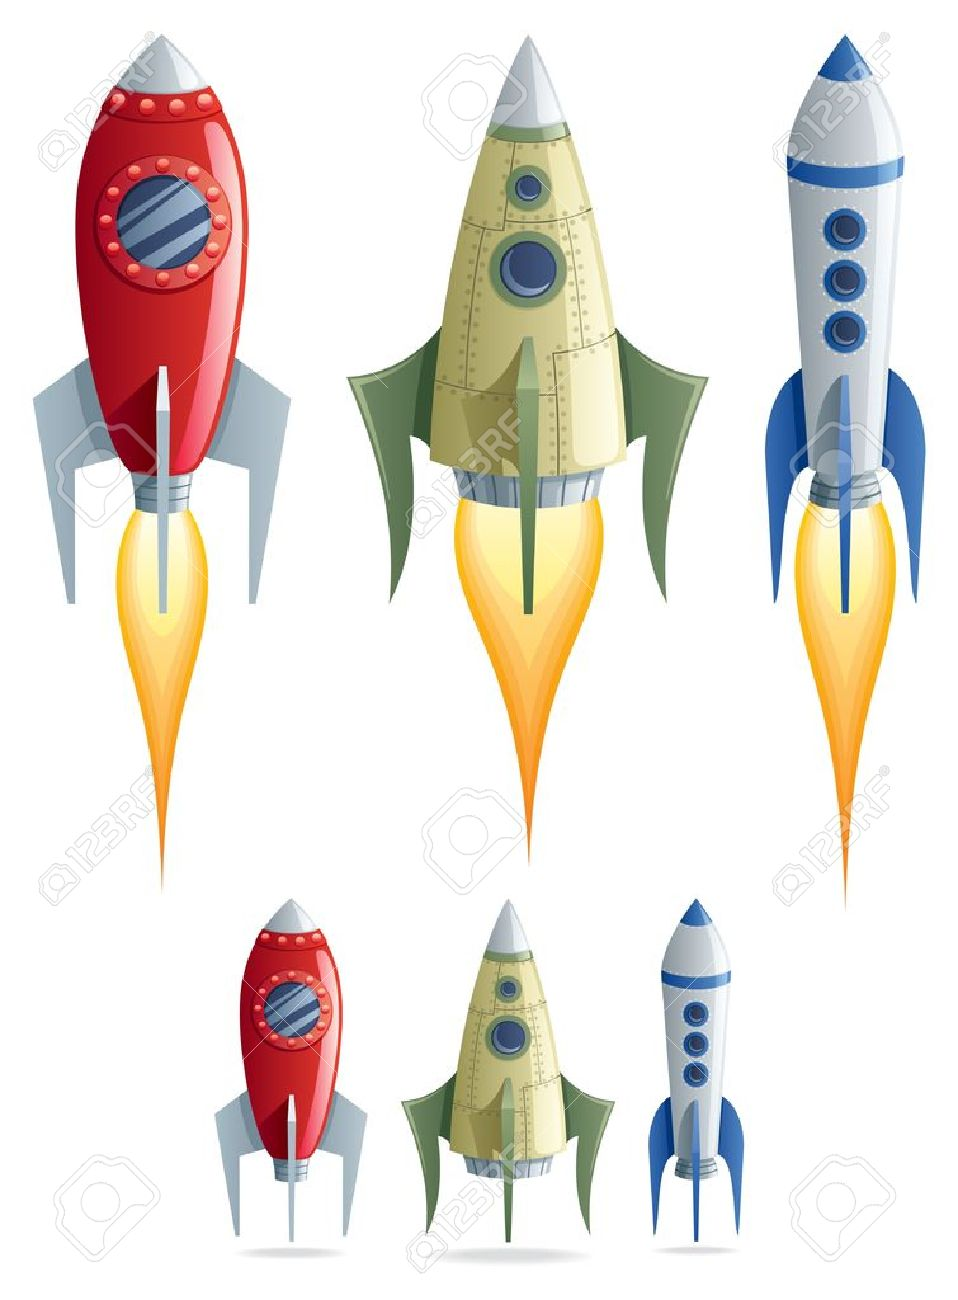 http://previews.123rf.com/images/malchev/malchev1110/malchev111000001/10826592-Set-of-3-cartoon-rockets-in-2-versions-No-transparency-used--Stock-Photo.jpg